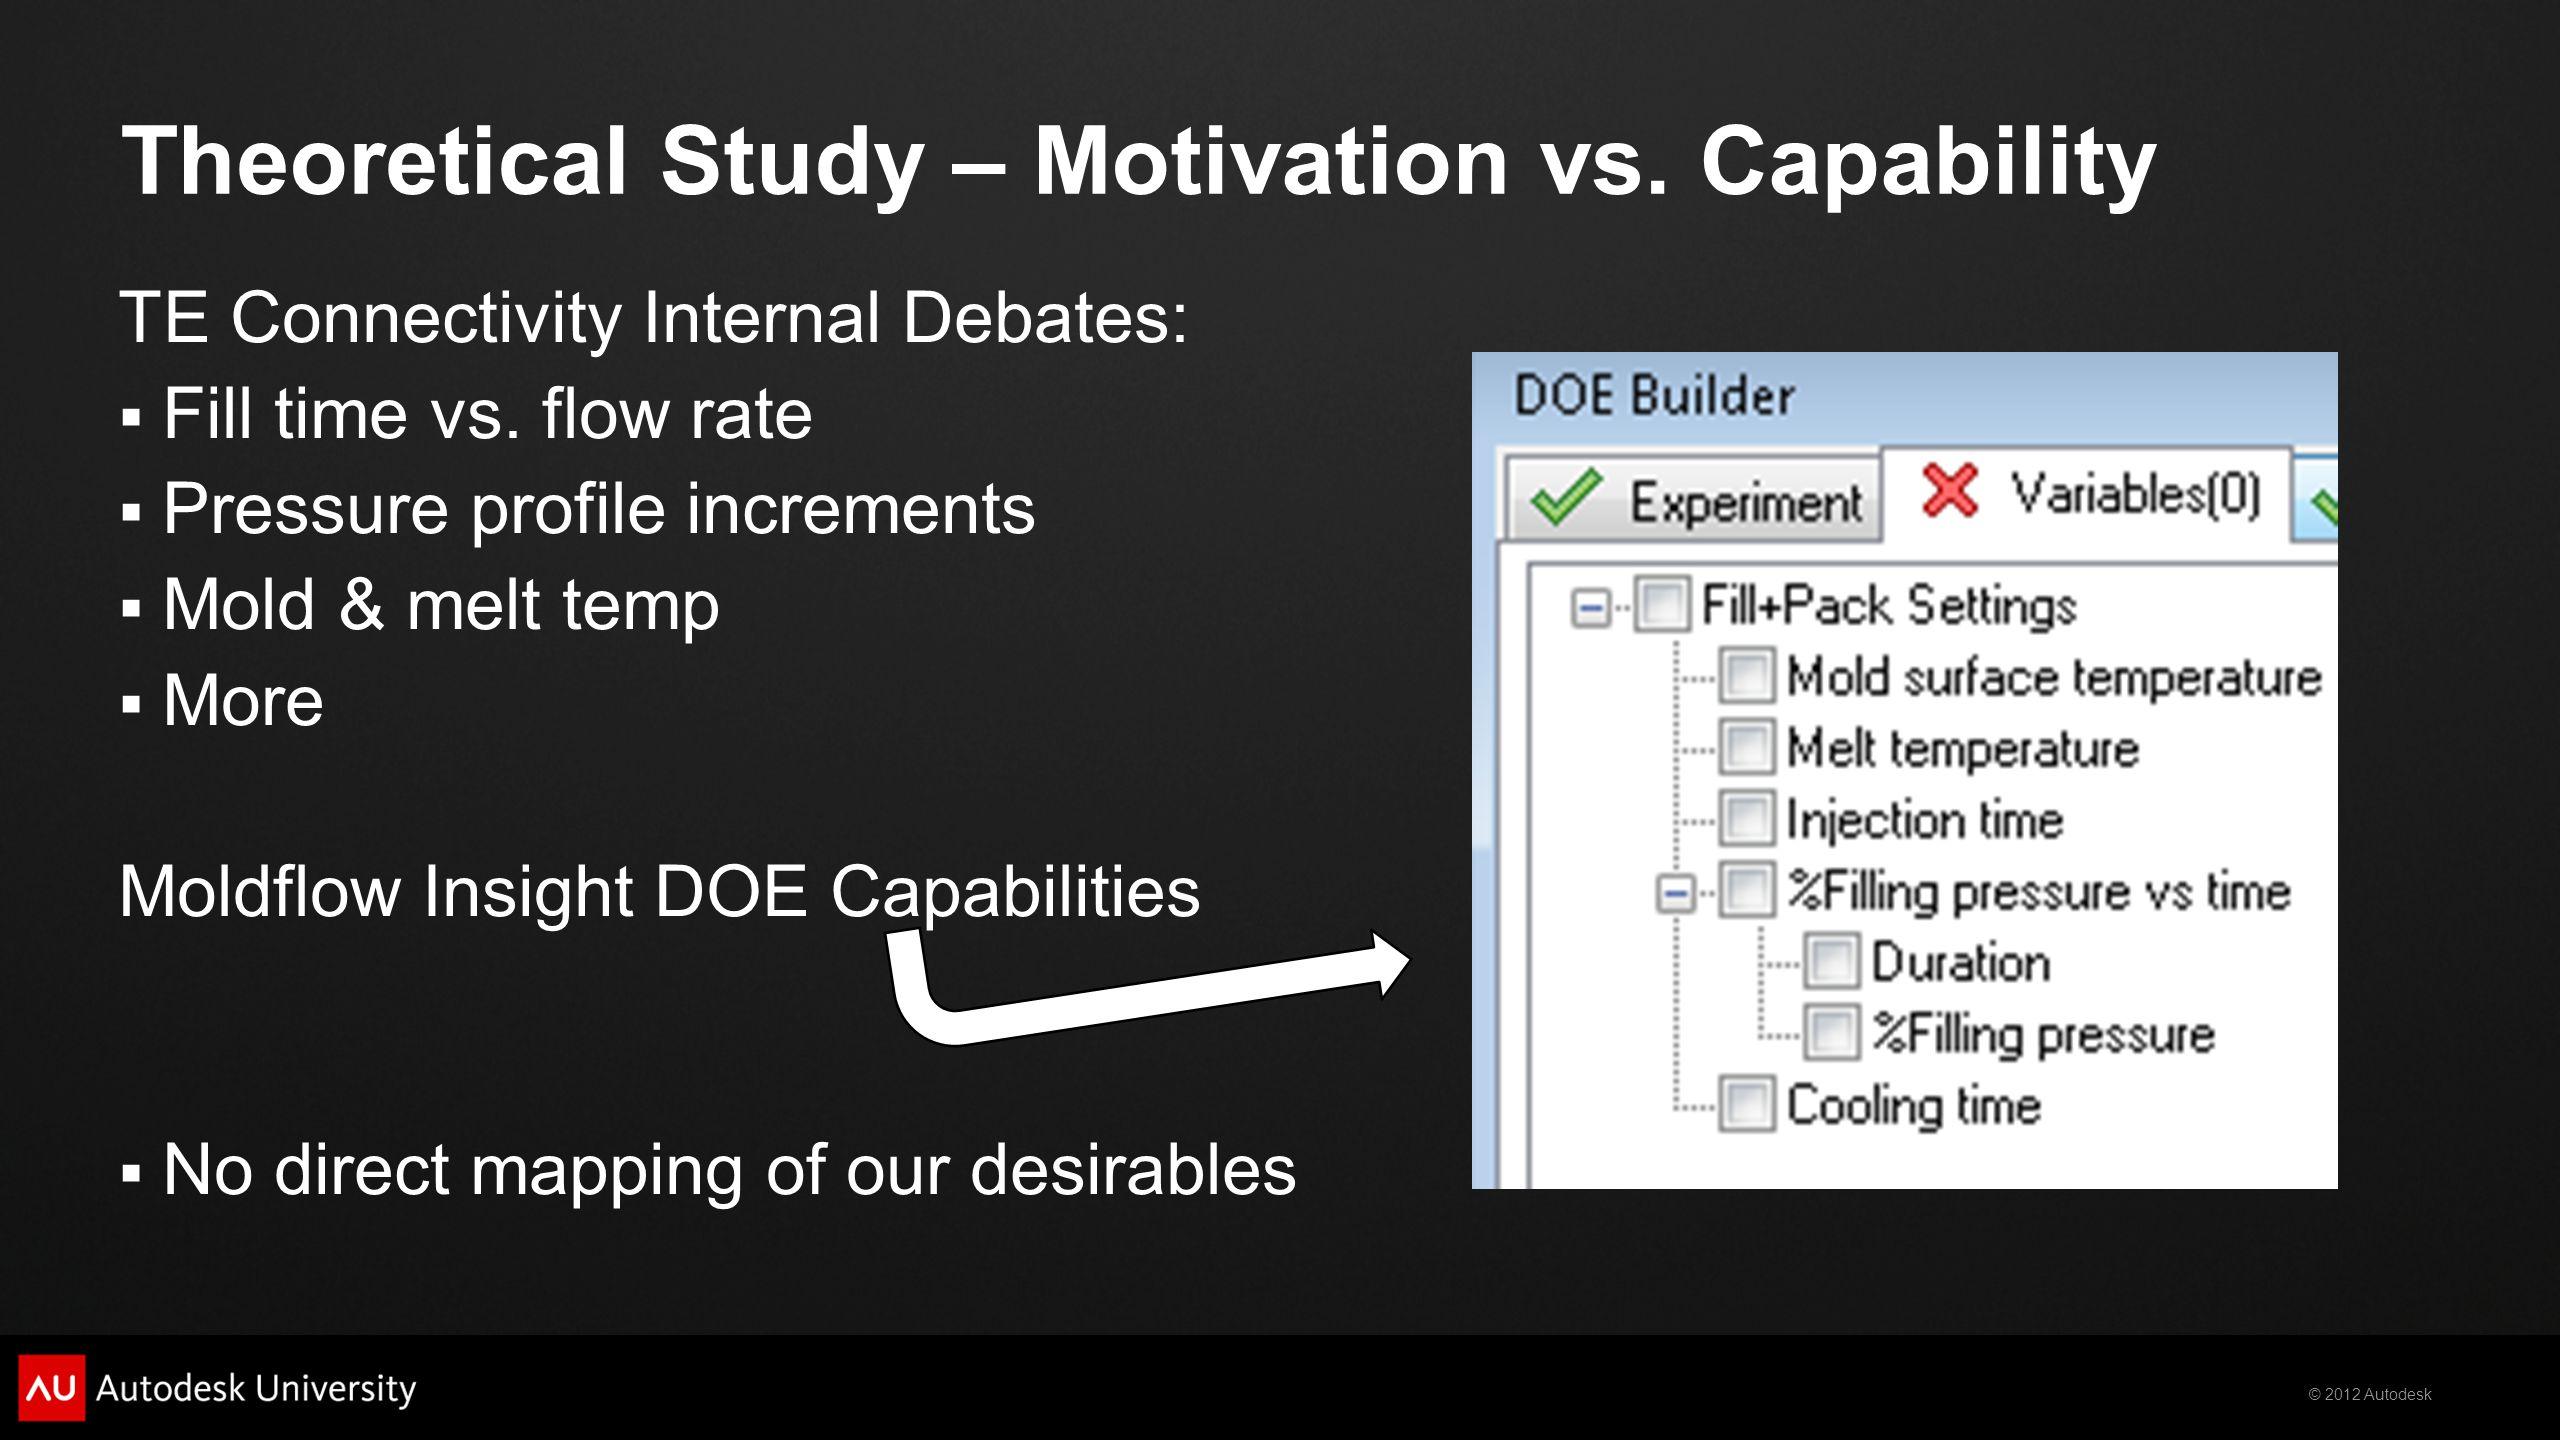 Theoretical Study – Motivation vs. Capability